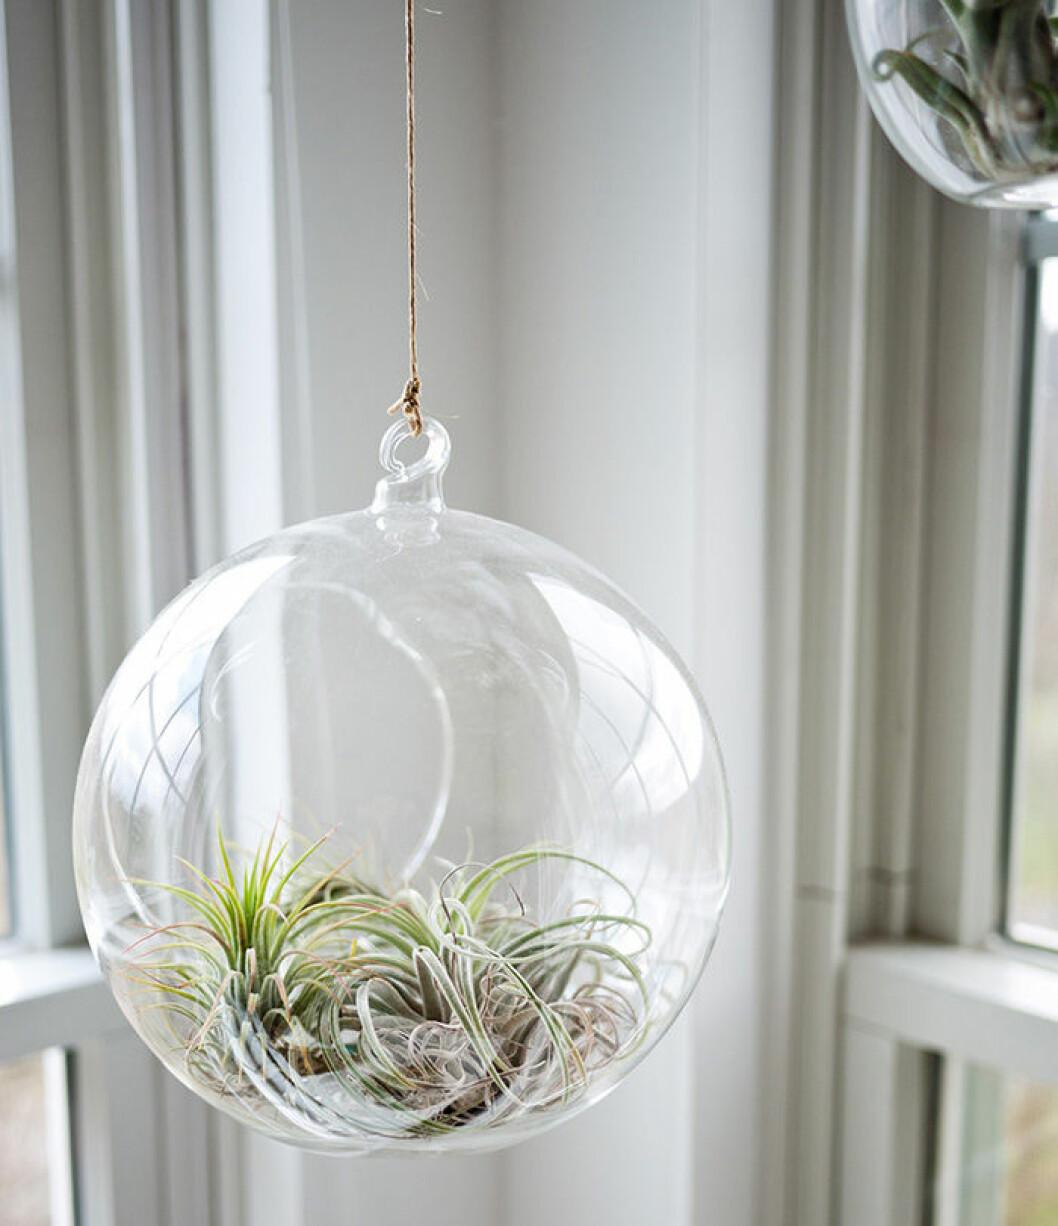 Luftplanta hängandes i en glaskula